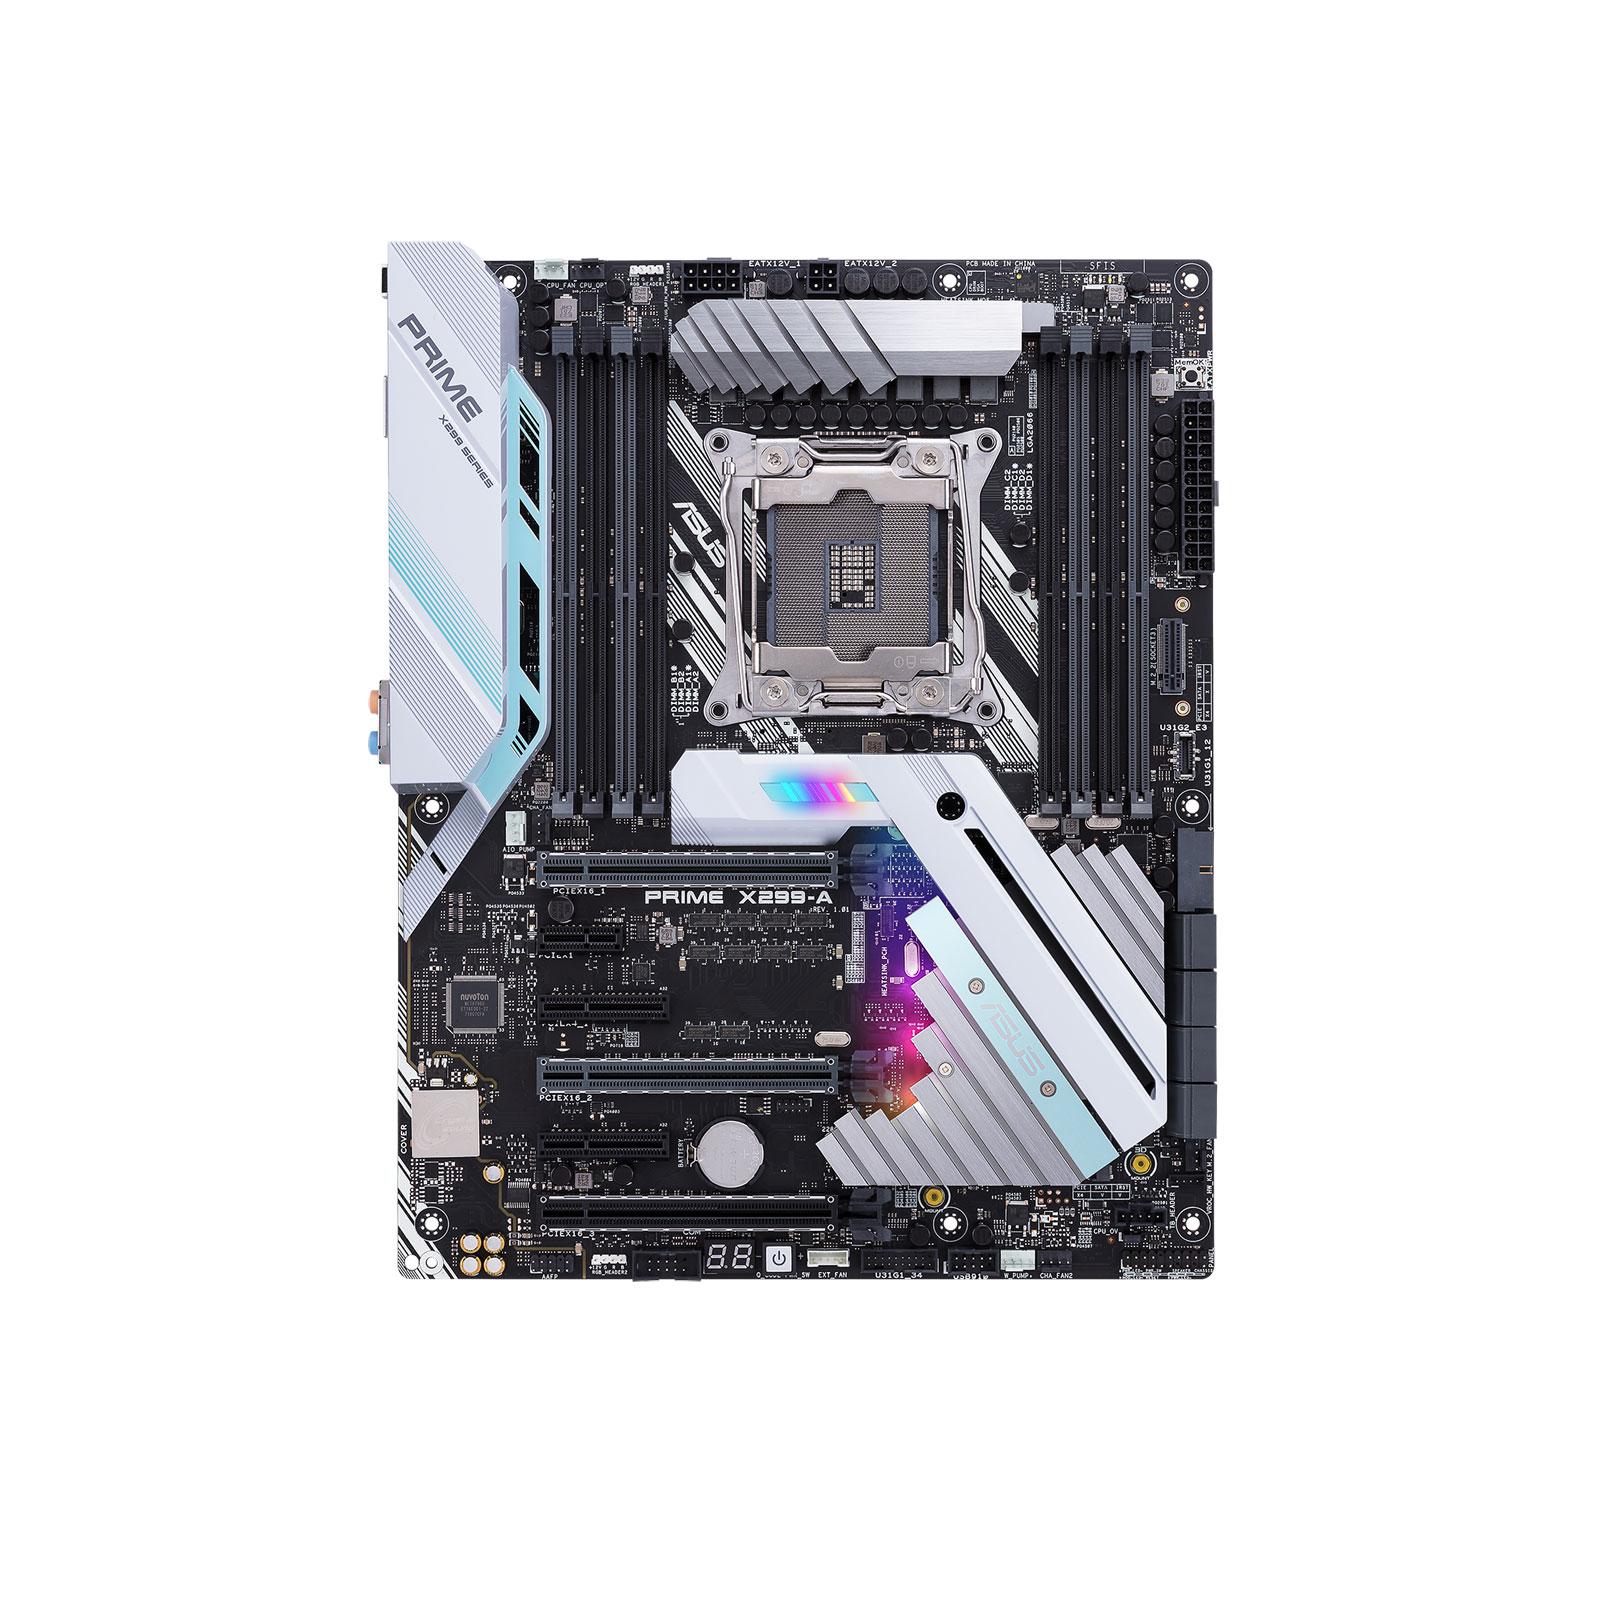 Asus PRIME X299-A ATX DDR4 - Carte mère Asus - Cybertek.fr - 1